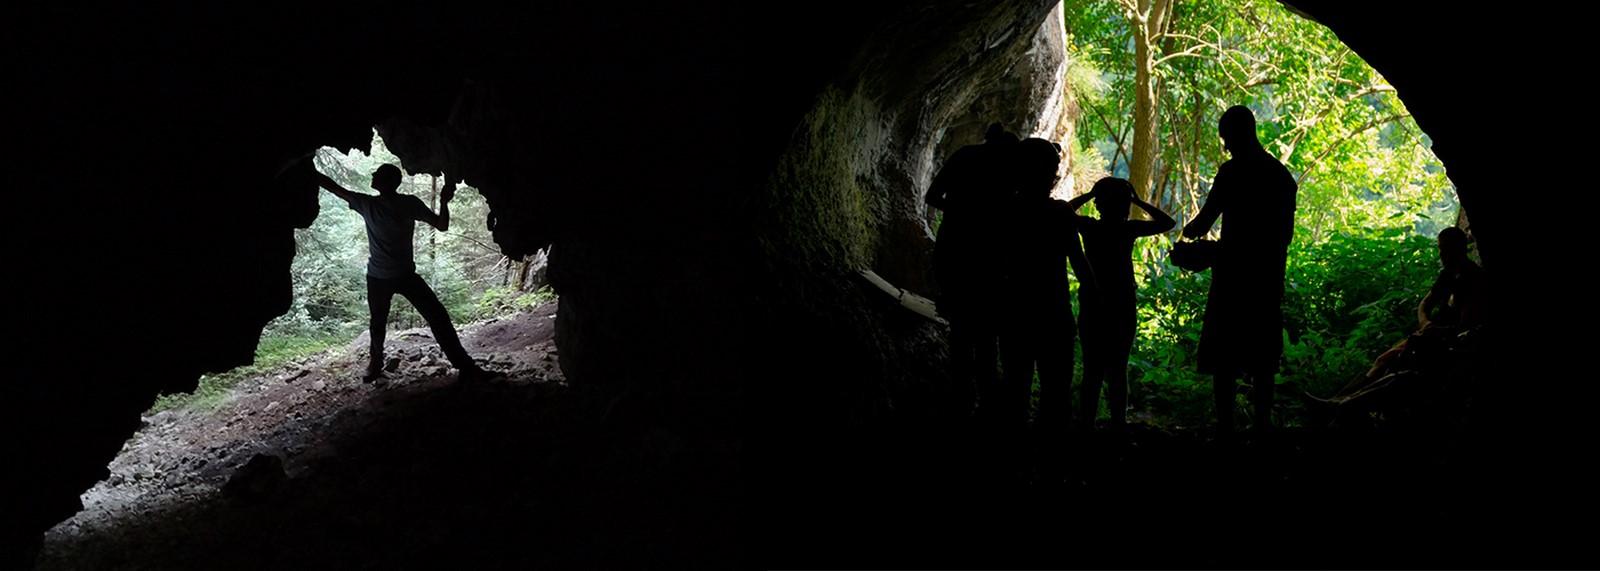 cavers2_new